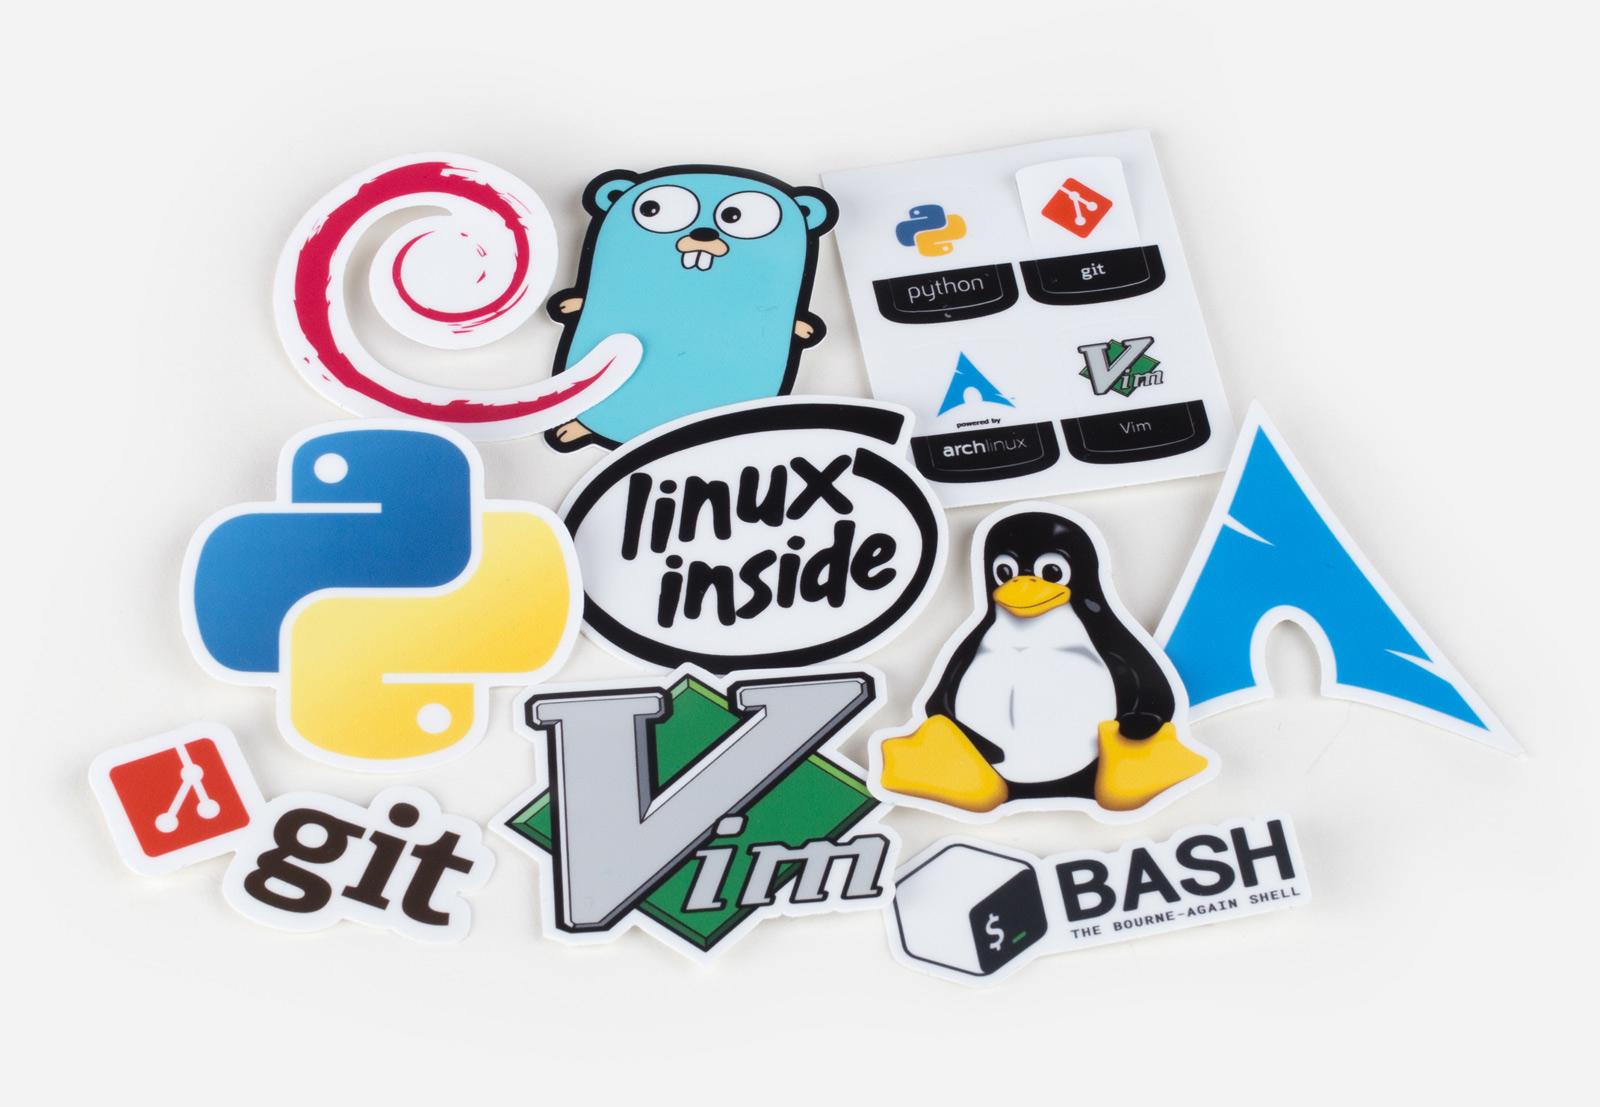 10 stickers - unix stickers pro pack - stickermule